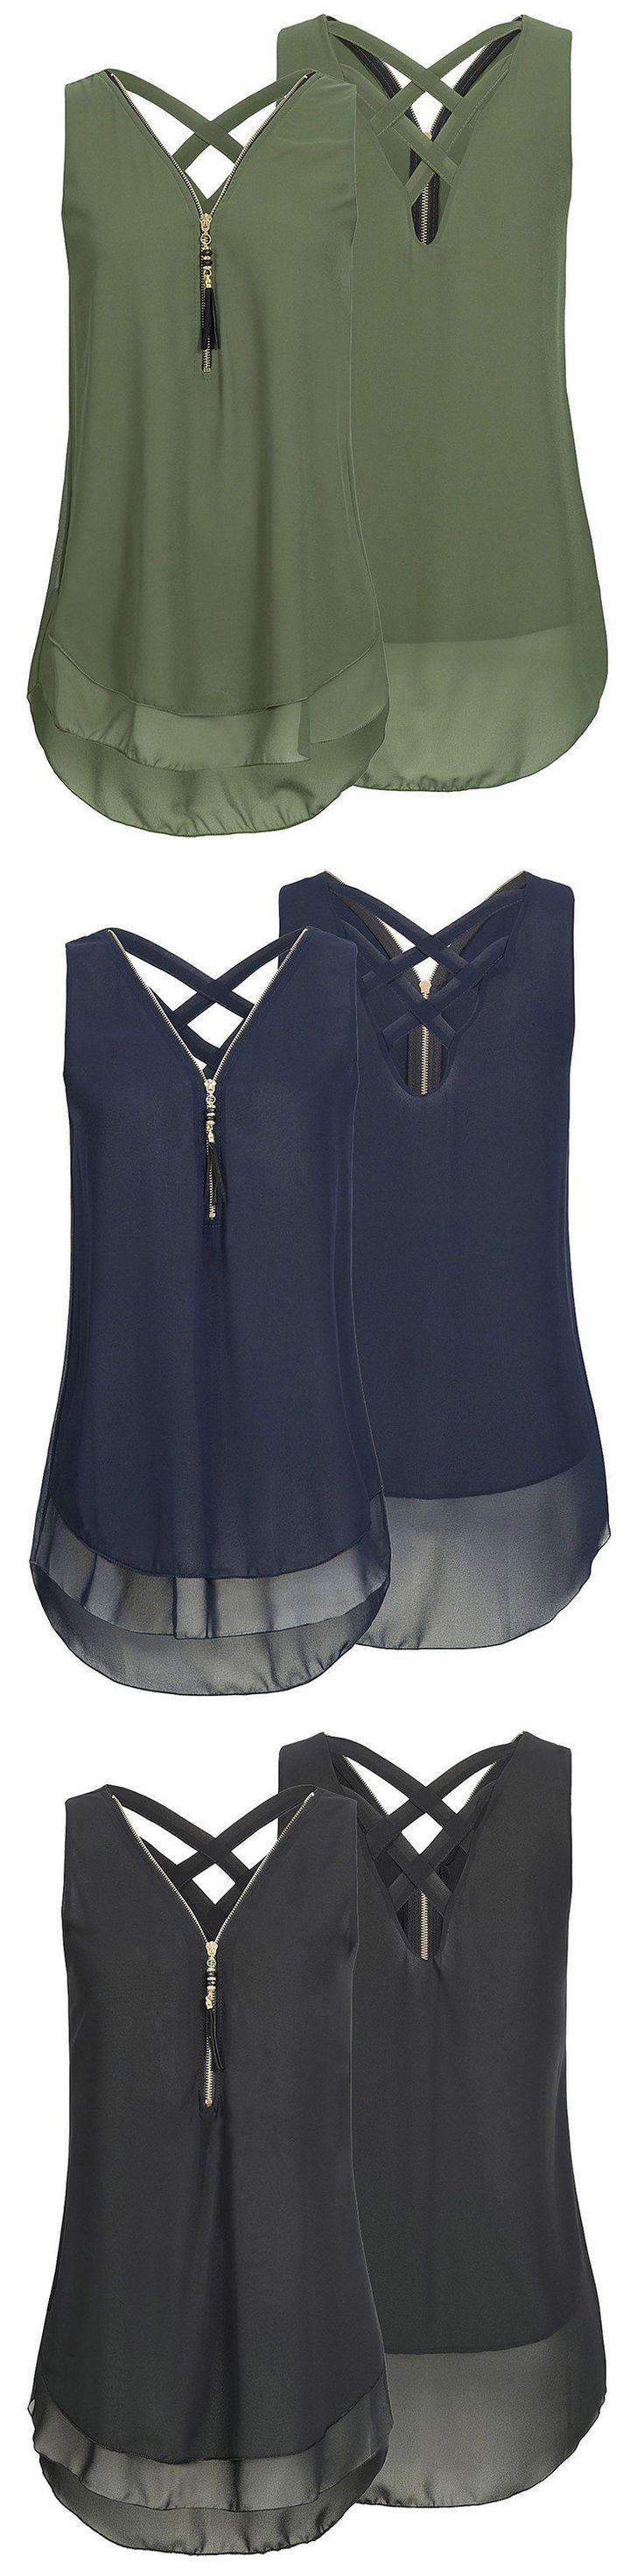 Casual Women Solid Zipper V-Neck Backless Chiffon Tank Tops